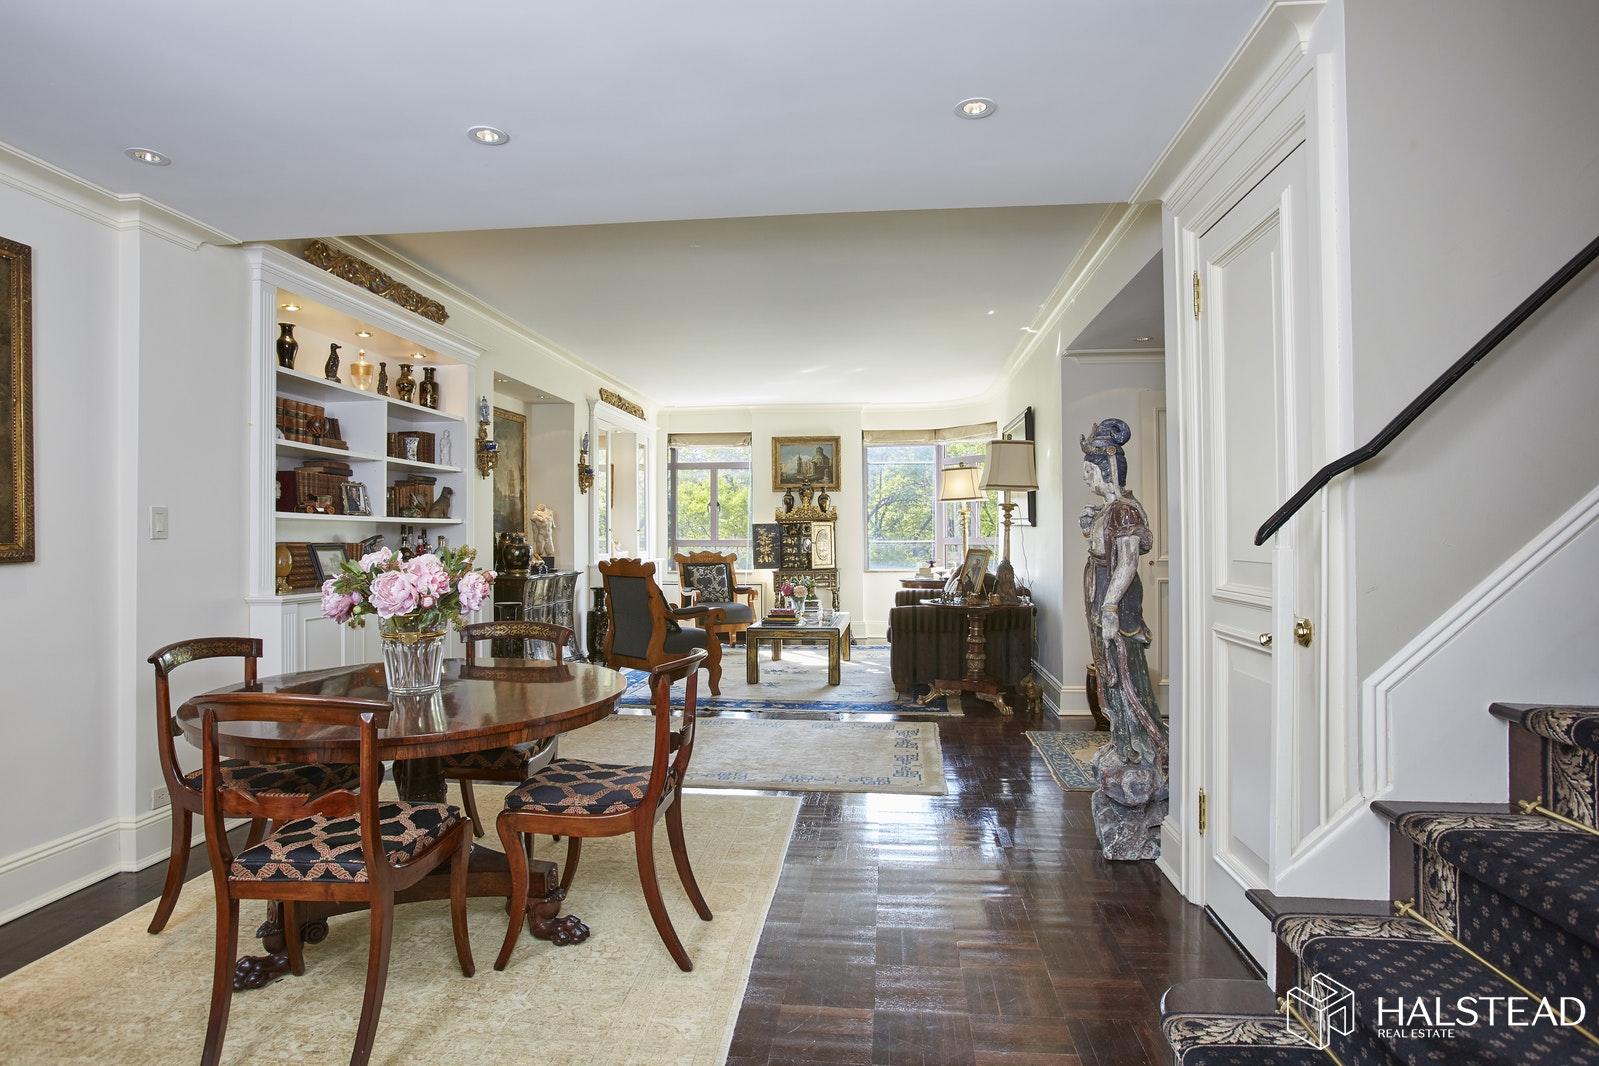 870 FIFTH AVENUE 8/9C, Upper East Side, $2,095,000, Web #: 18058955